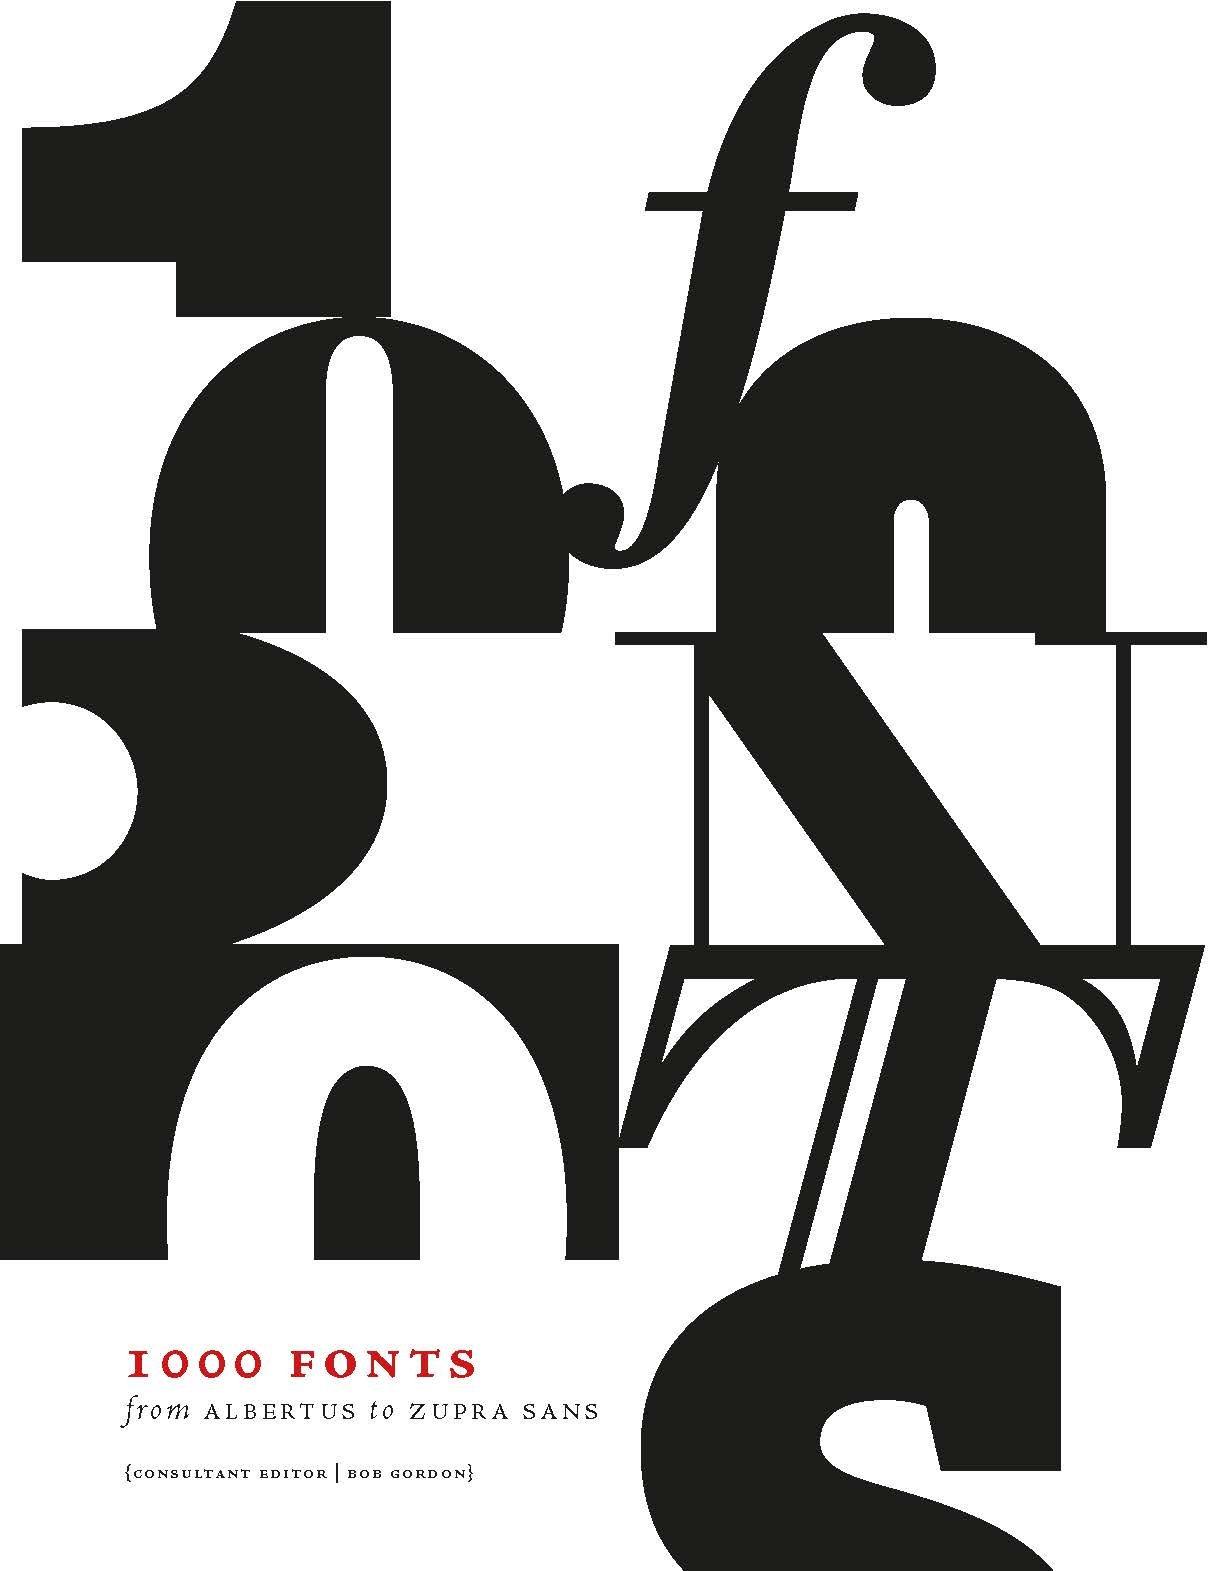 1000 fonts (Anglais) Broché – 2 octobre 2015 Bob Gordon The Ivy Press 178240287X Fotografie